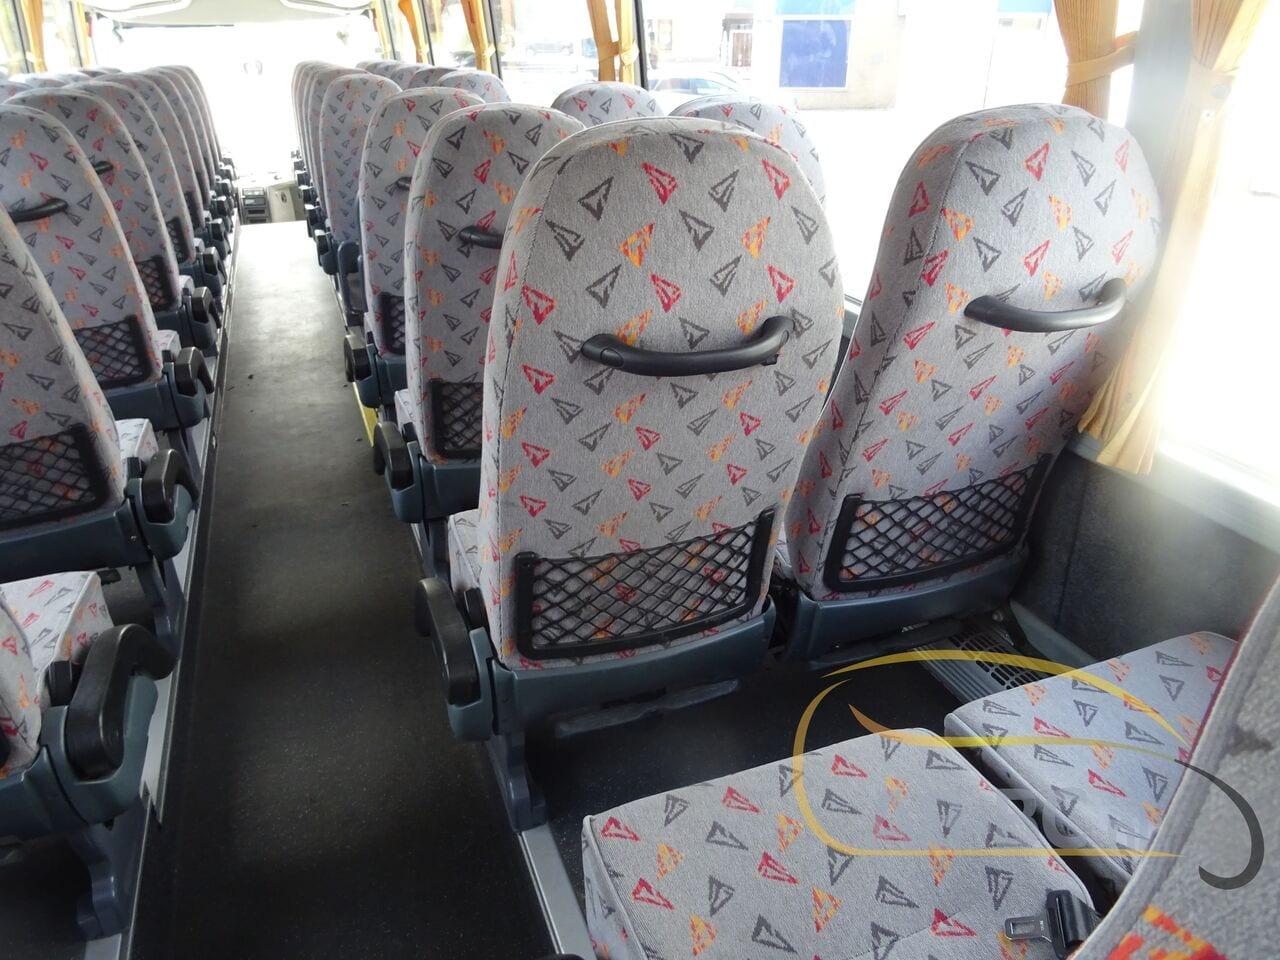 coach-busTEMSA-Safari-RD-DAF-Motor-53-Seats-Euro-5---1623932606970177014_big_e52fadcac07e03f9ba2c936aabe73d24--21061715155620919600